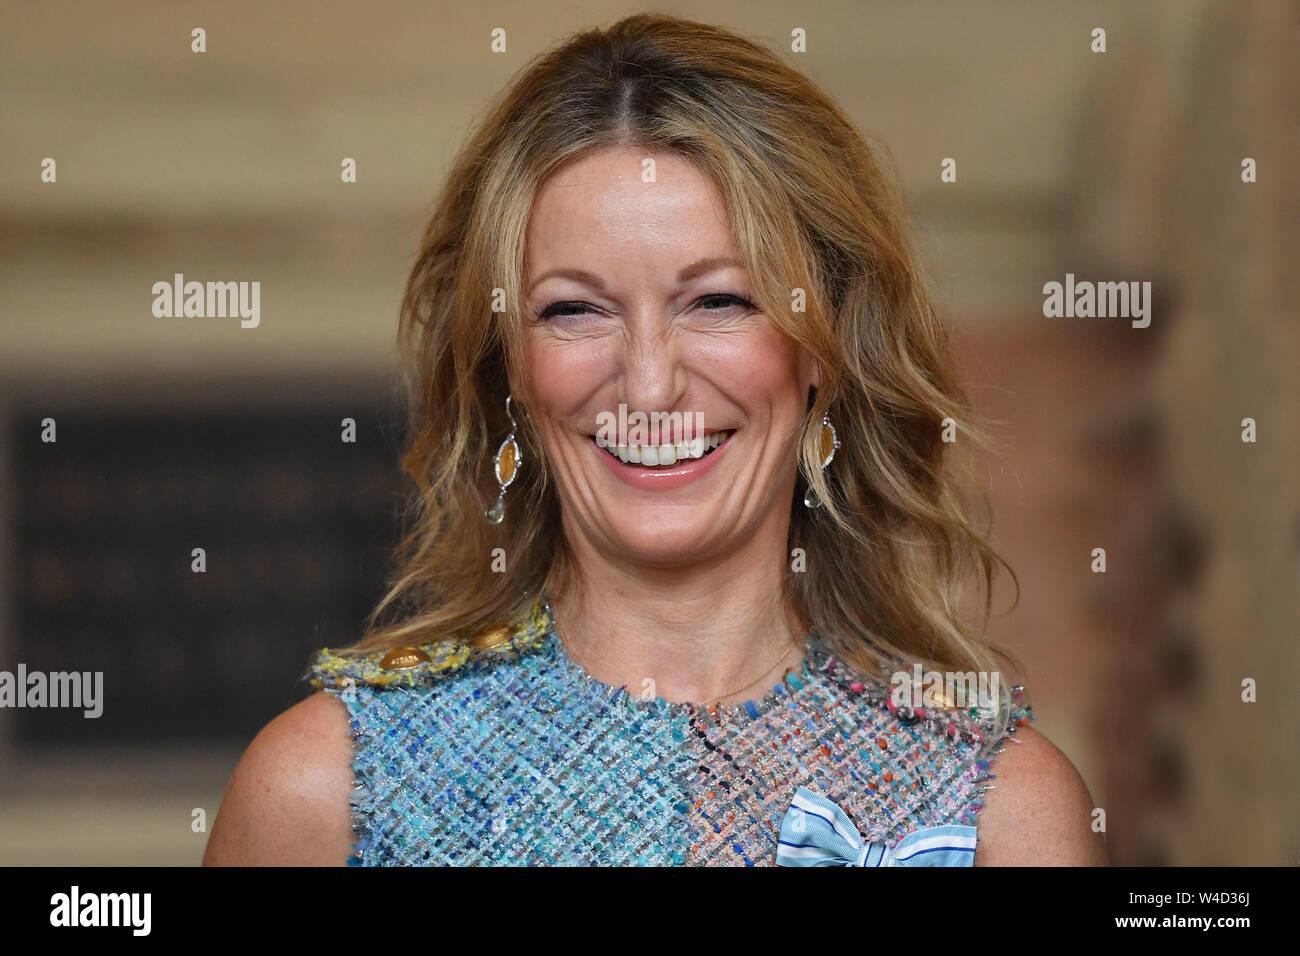 Munich Deutschland 22nd July 2019 Monika Gruber Comedian Single Image Single Motif Portrait Portrait Portraits Presentation